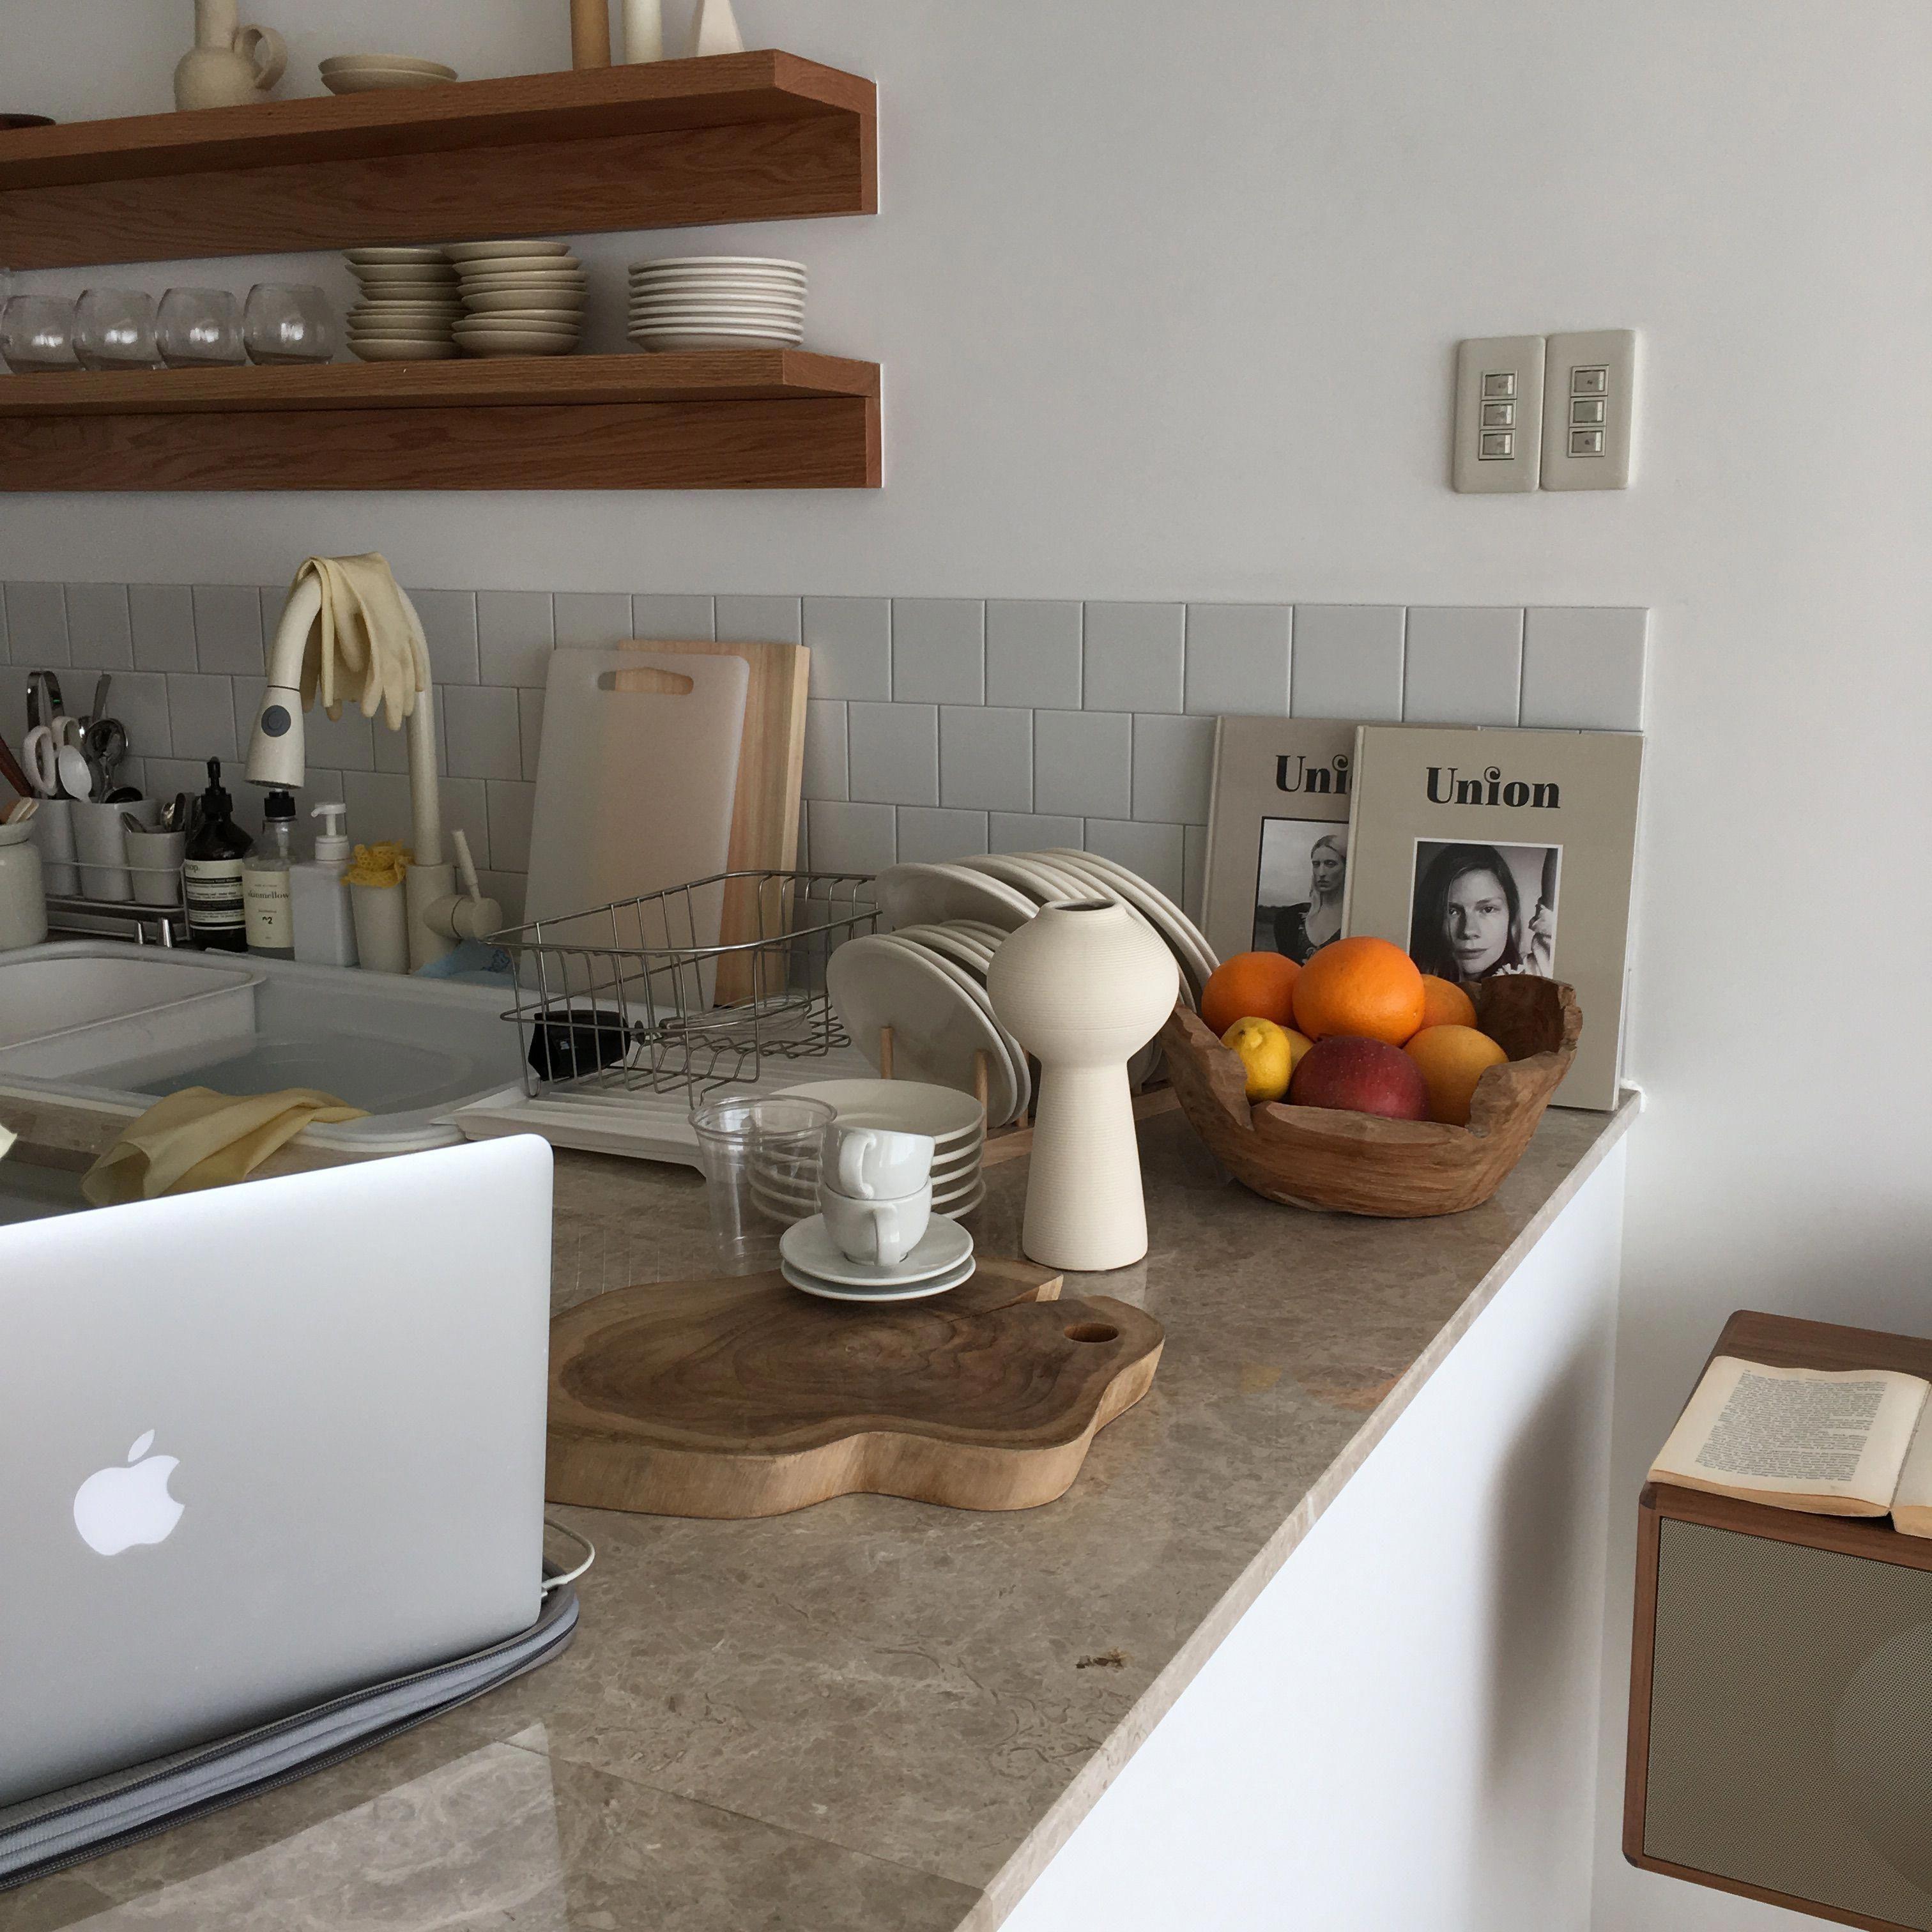 ᴾᵁᴸᴸᴵᴺᴳ ᴰᴼᵂᴺ ˢᵀᴬᴿˢ ᴶᵁˢᵀ ᵀᴼ ᴹᴬᴷᴱ ᵁ ᴳᴸᴼᵂ kitchen interior on kitchen decor korea id=84866